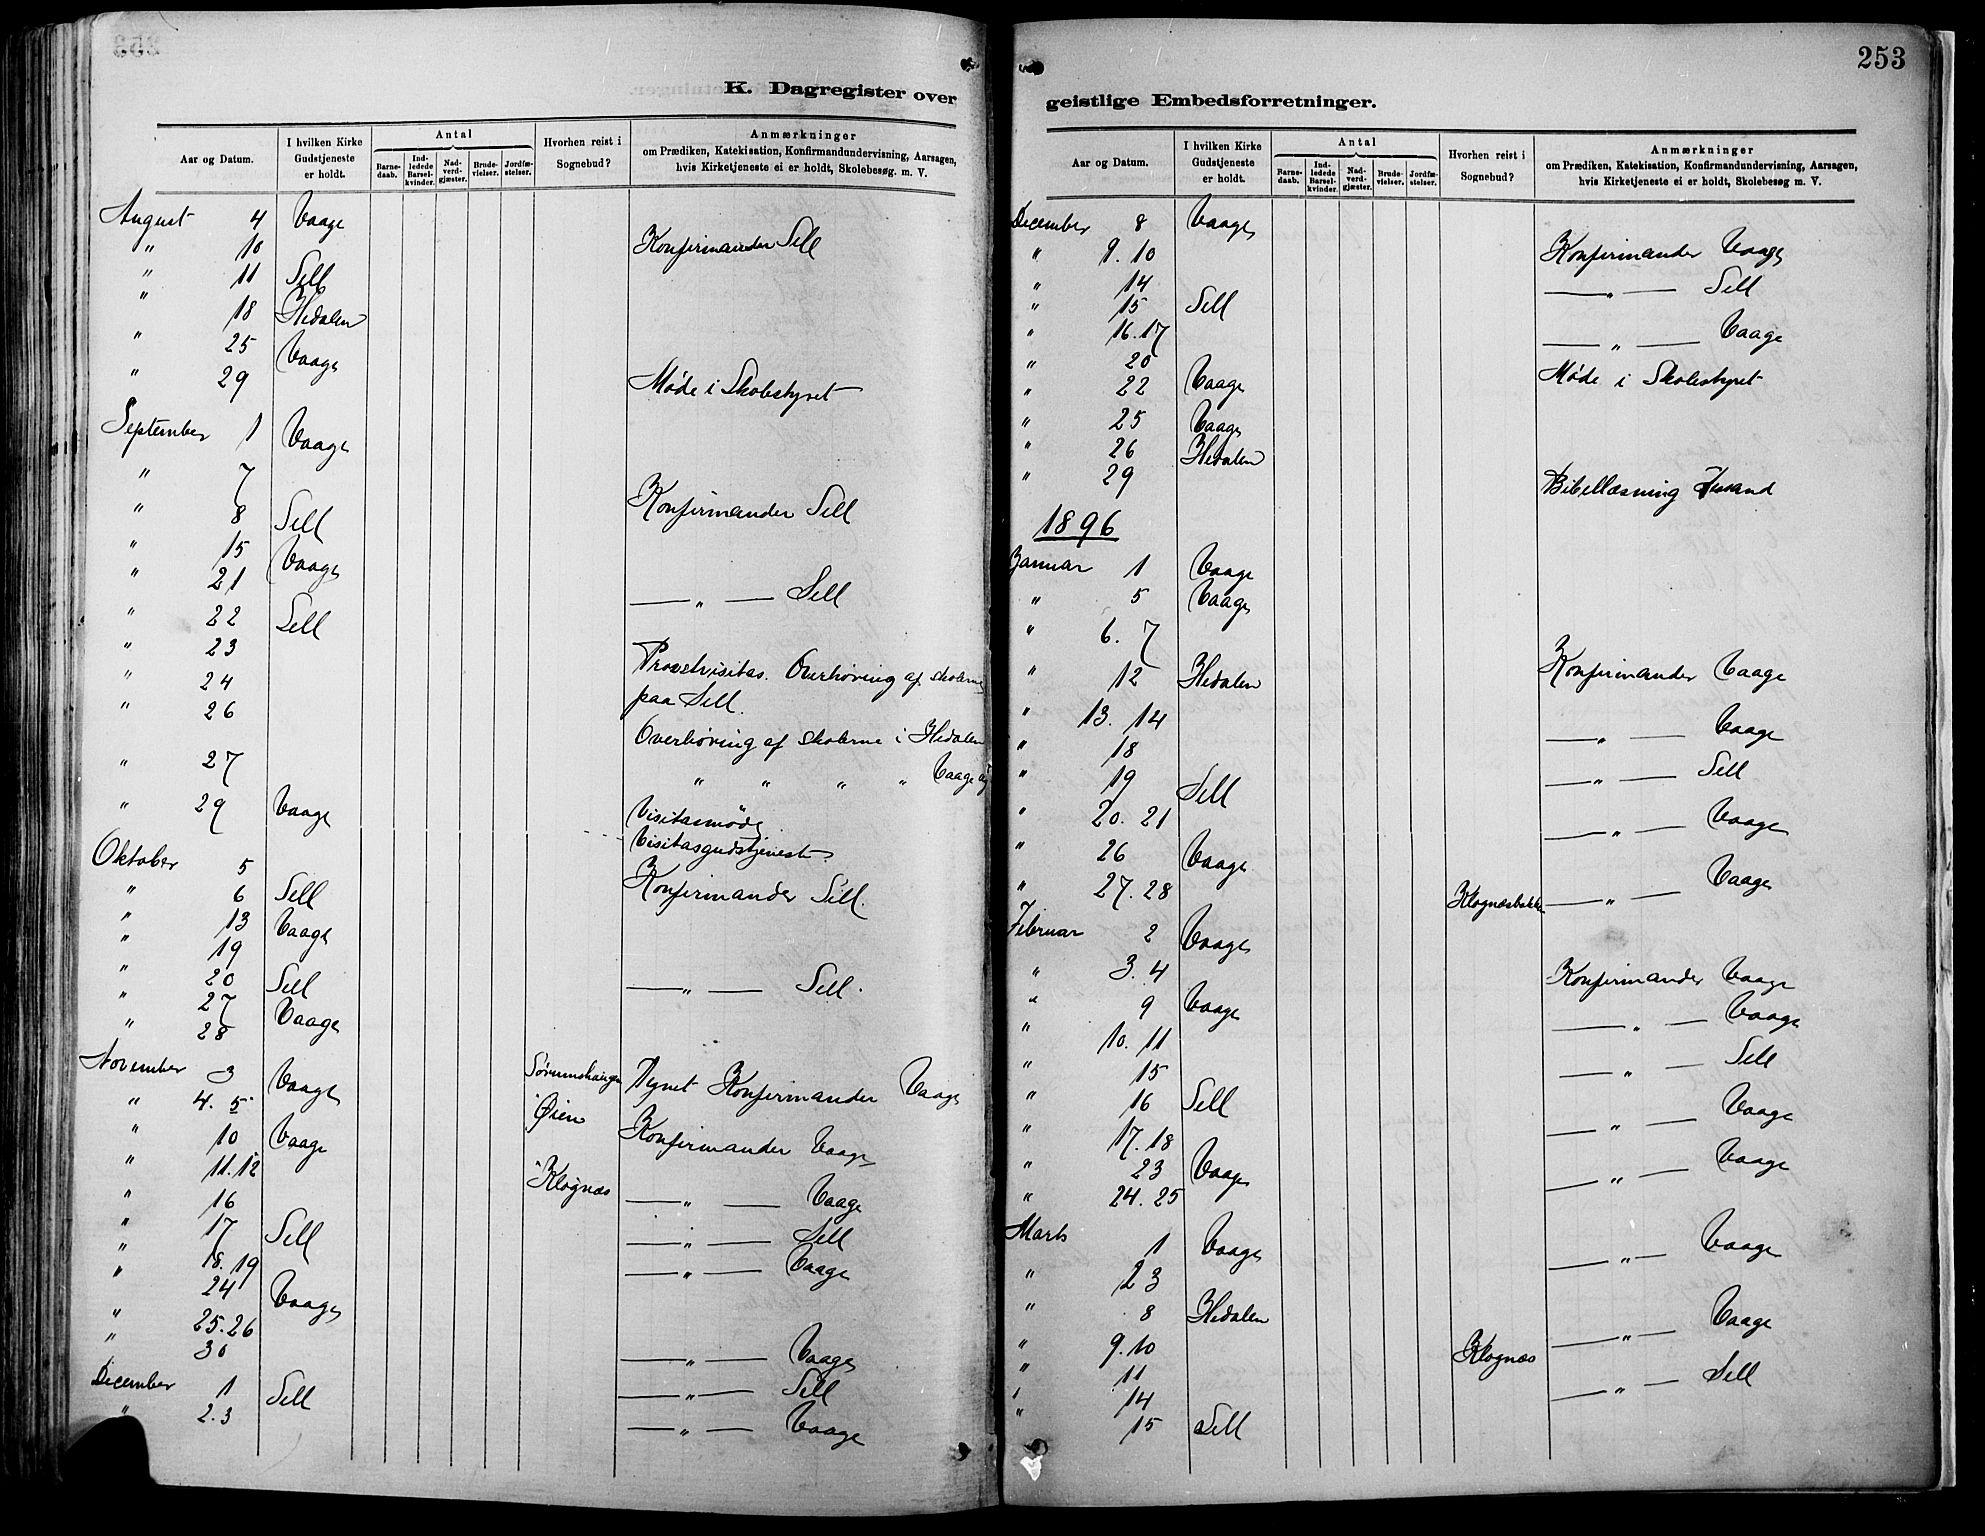 SAH, Vågå prestekontor, Ministerialbok nr. 9, 1886-1904, s. 253